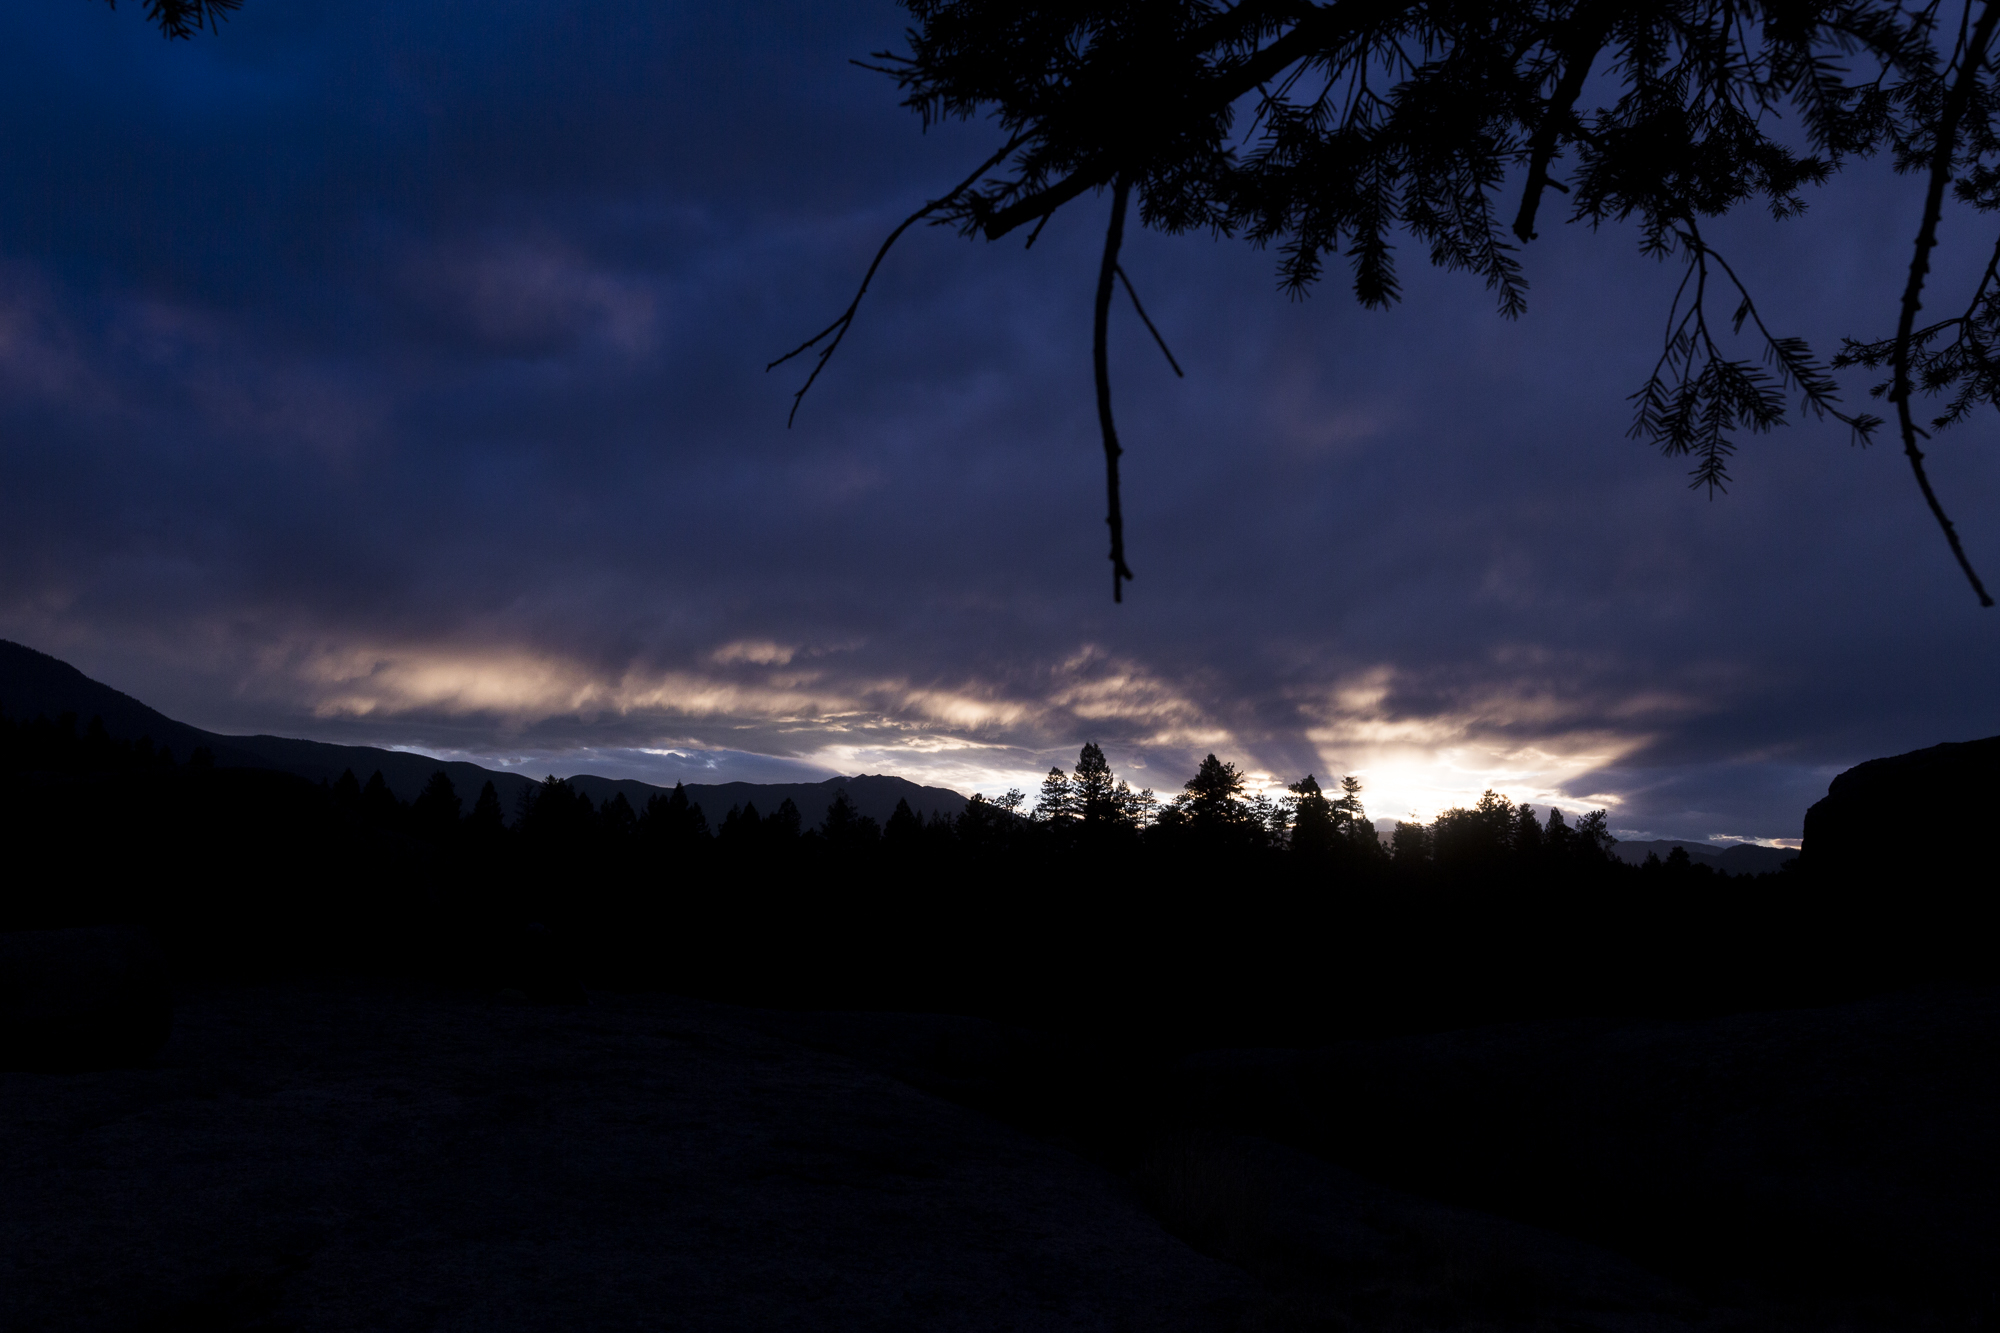 Pike_National_Forest_Bouldering_CO-4974.jpg